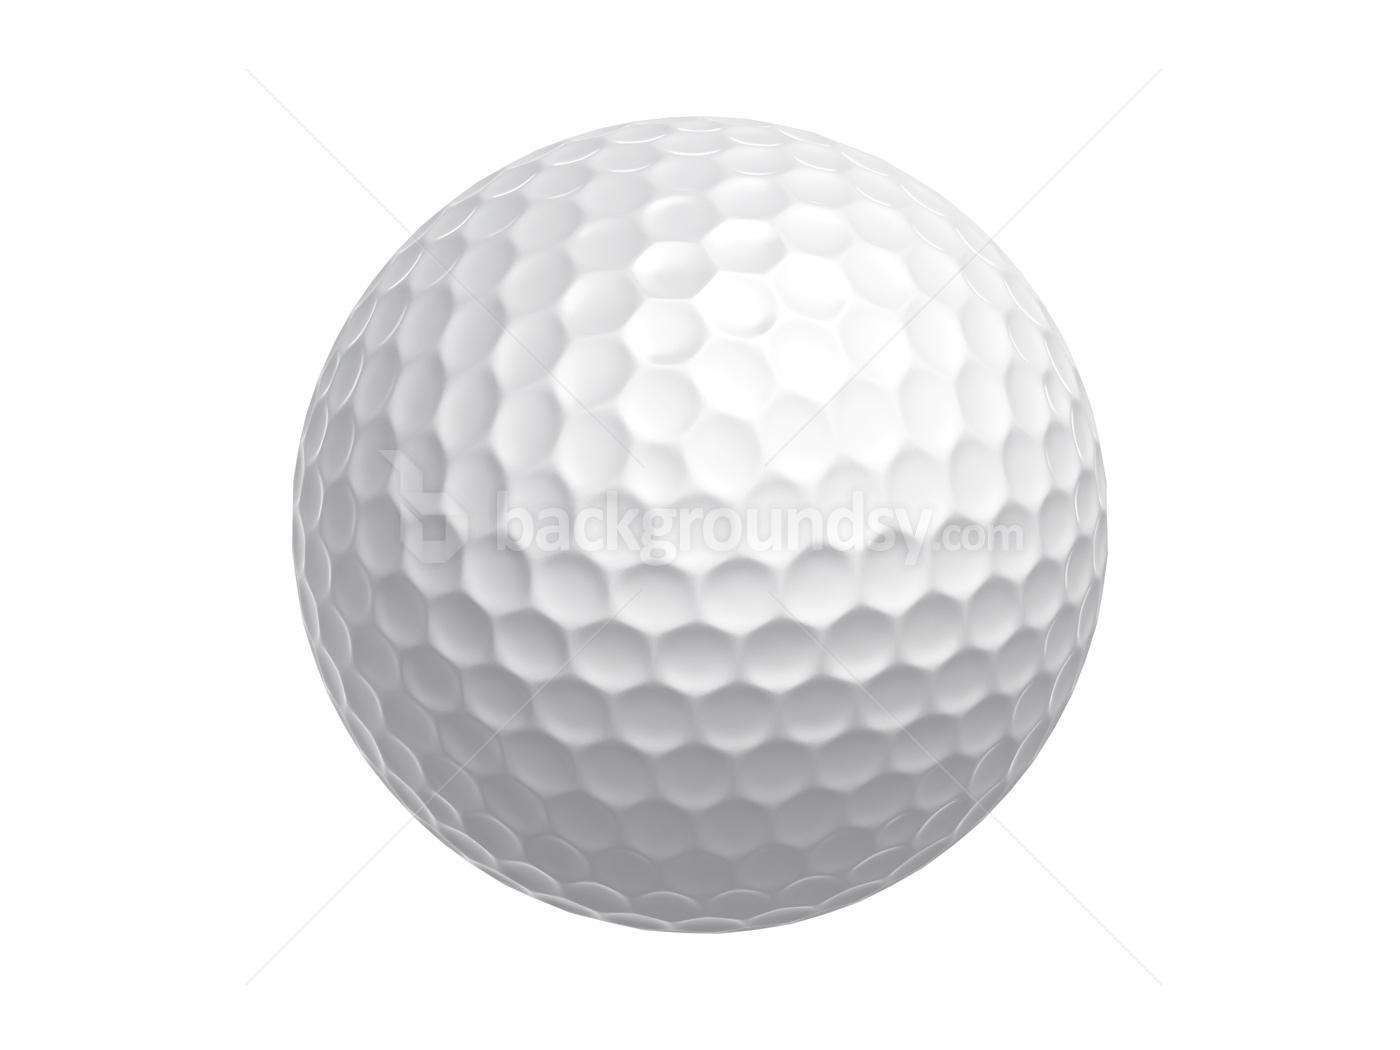 Golf ball clipart image free Free Golf Balls Cliparts, Download Free Clip Art, Free Clip Art on ... image free